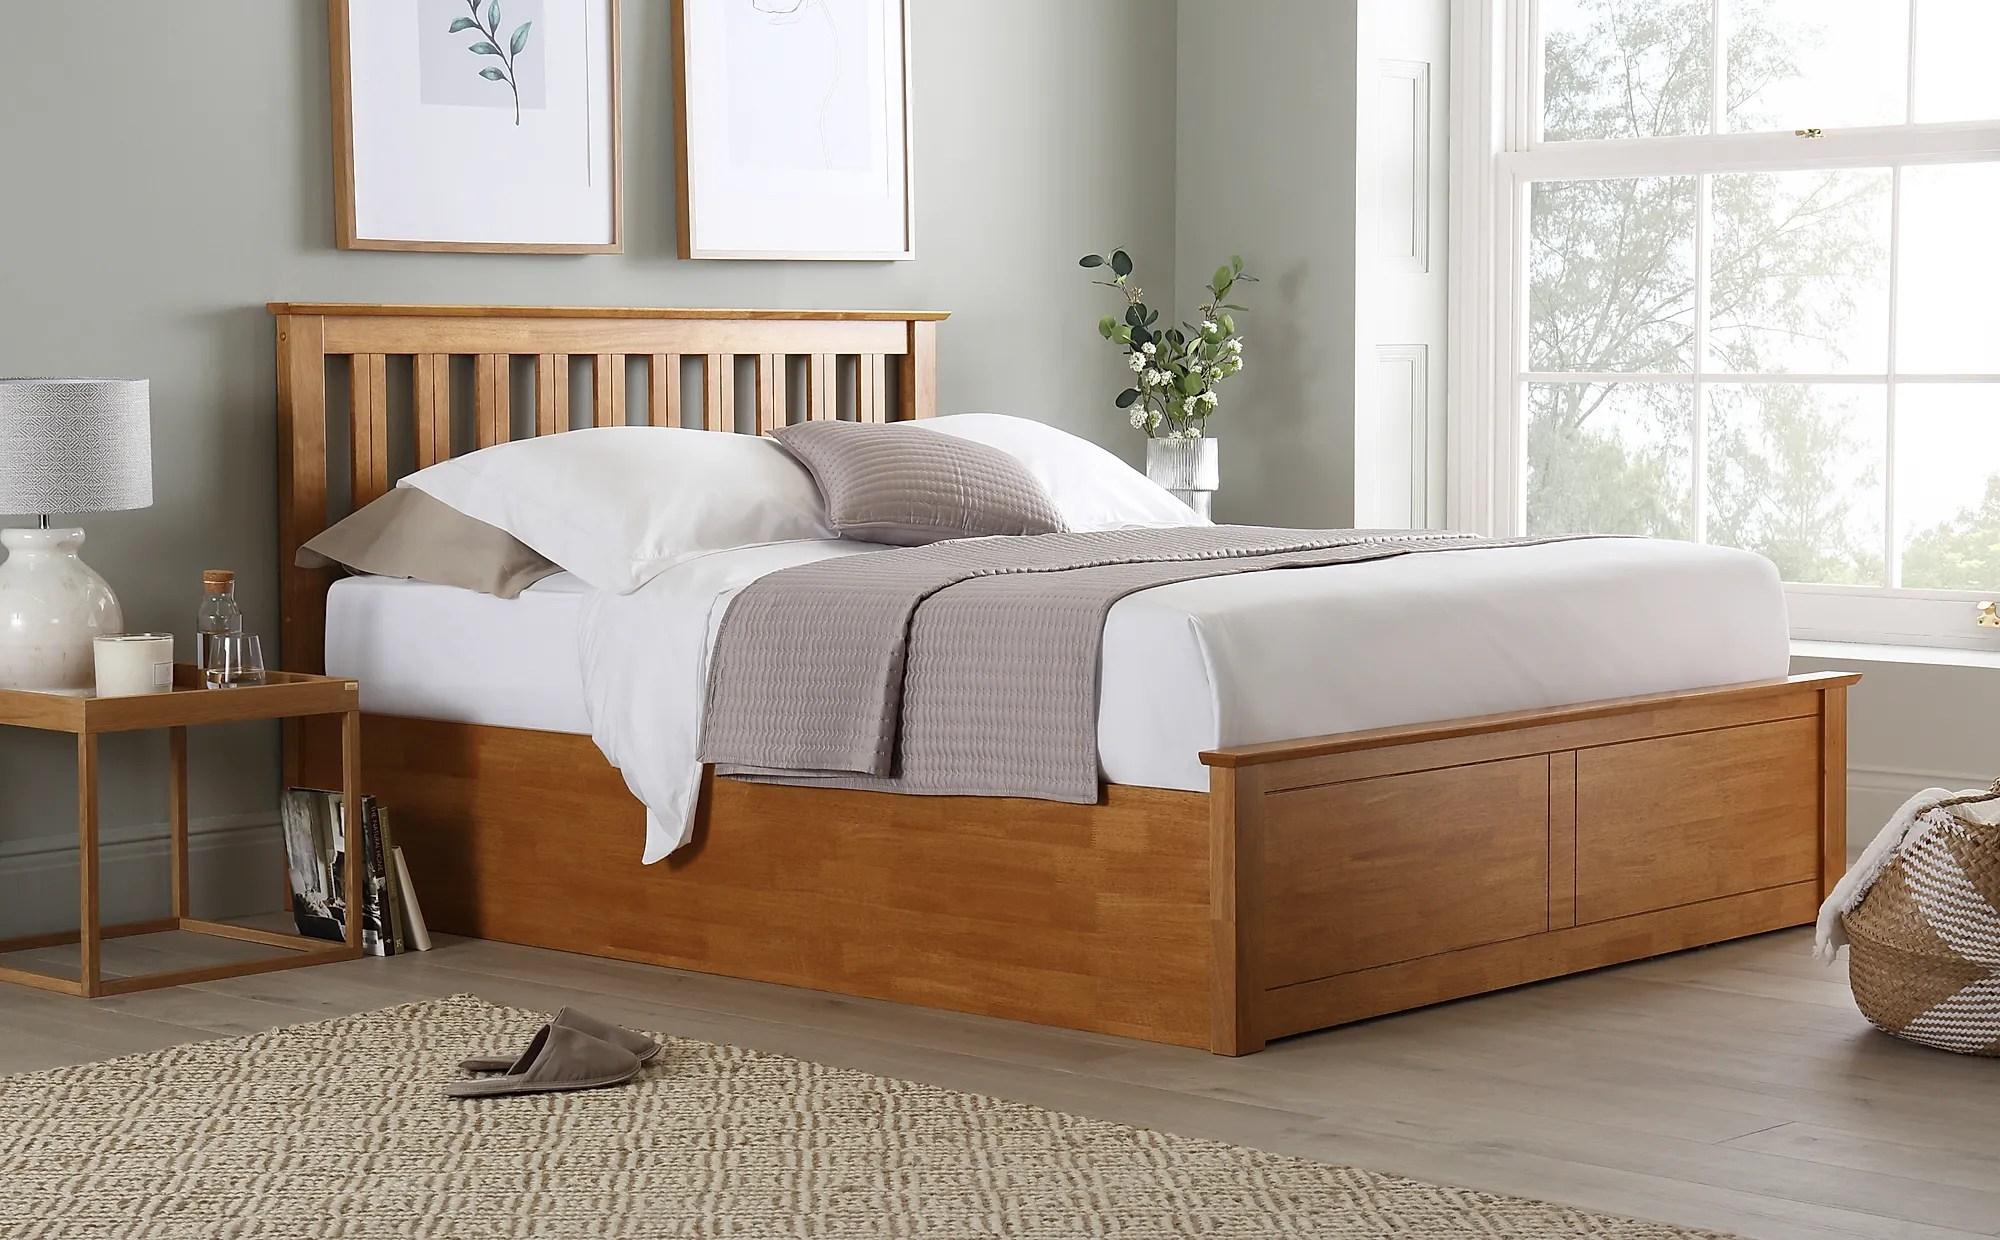 Phoenix Oak Wooden Ottoman Storage Bed Bed King Size Only